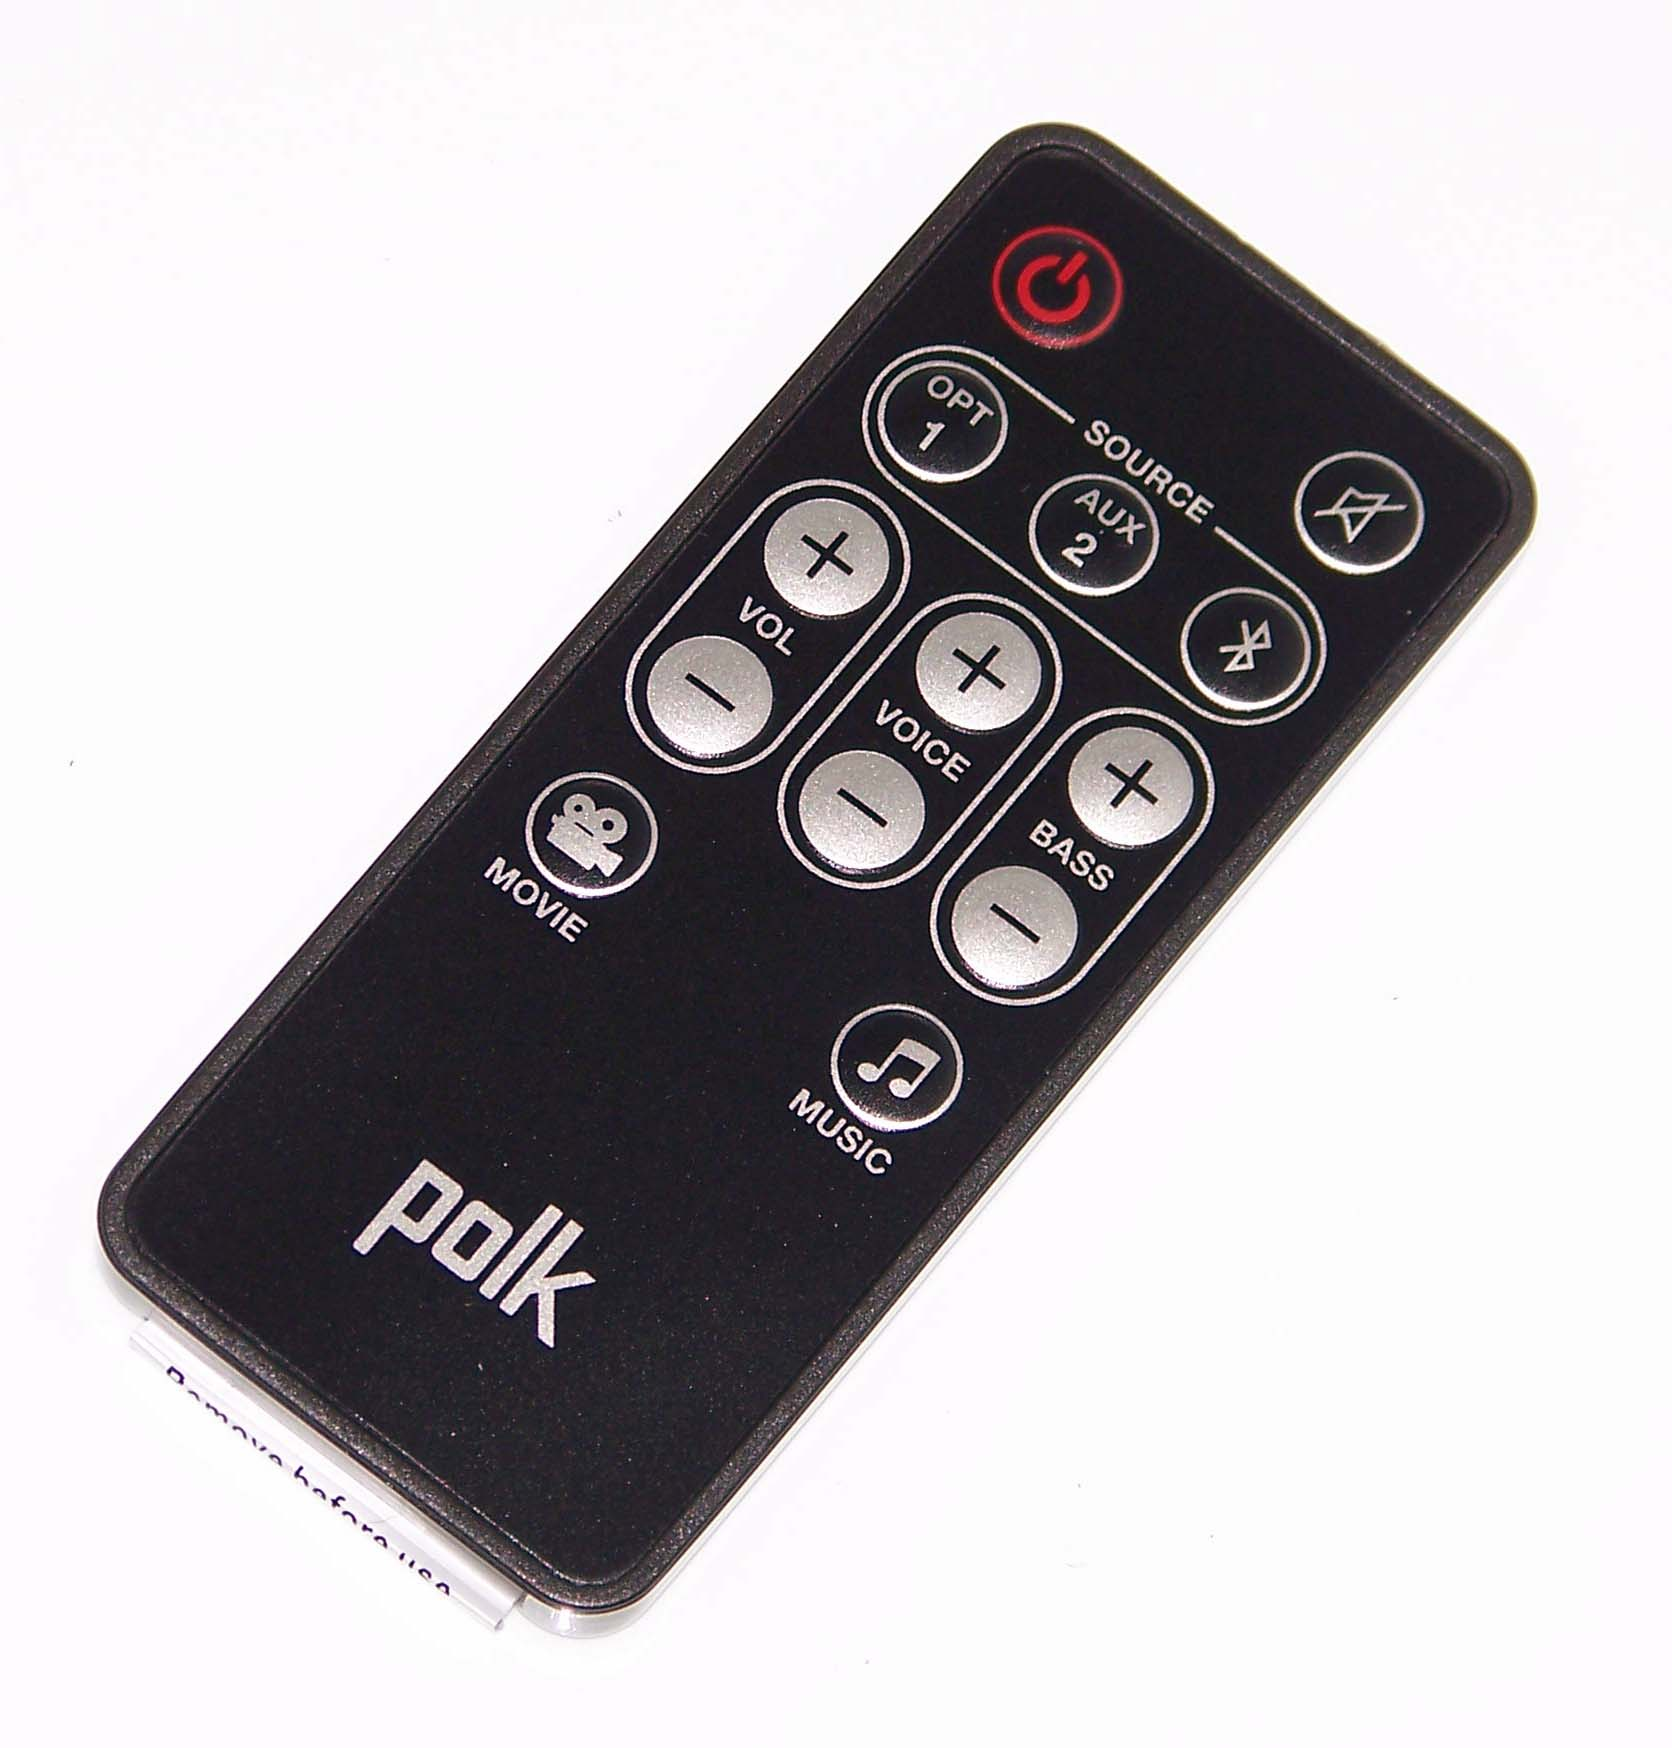 OEM Polk Remote Control Originally Shipped With: MagNIFI, MagNIFI Soundbar by Polk%27s Meat